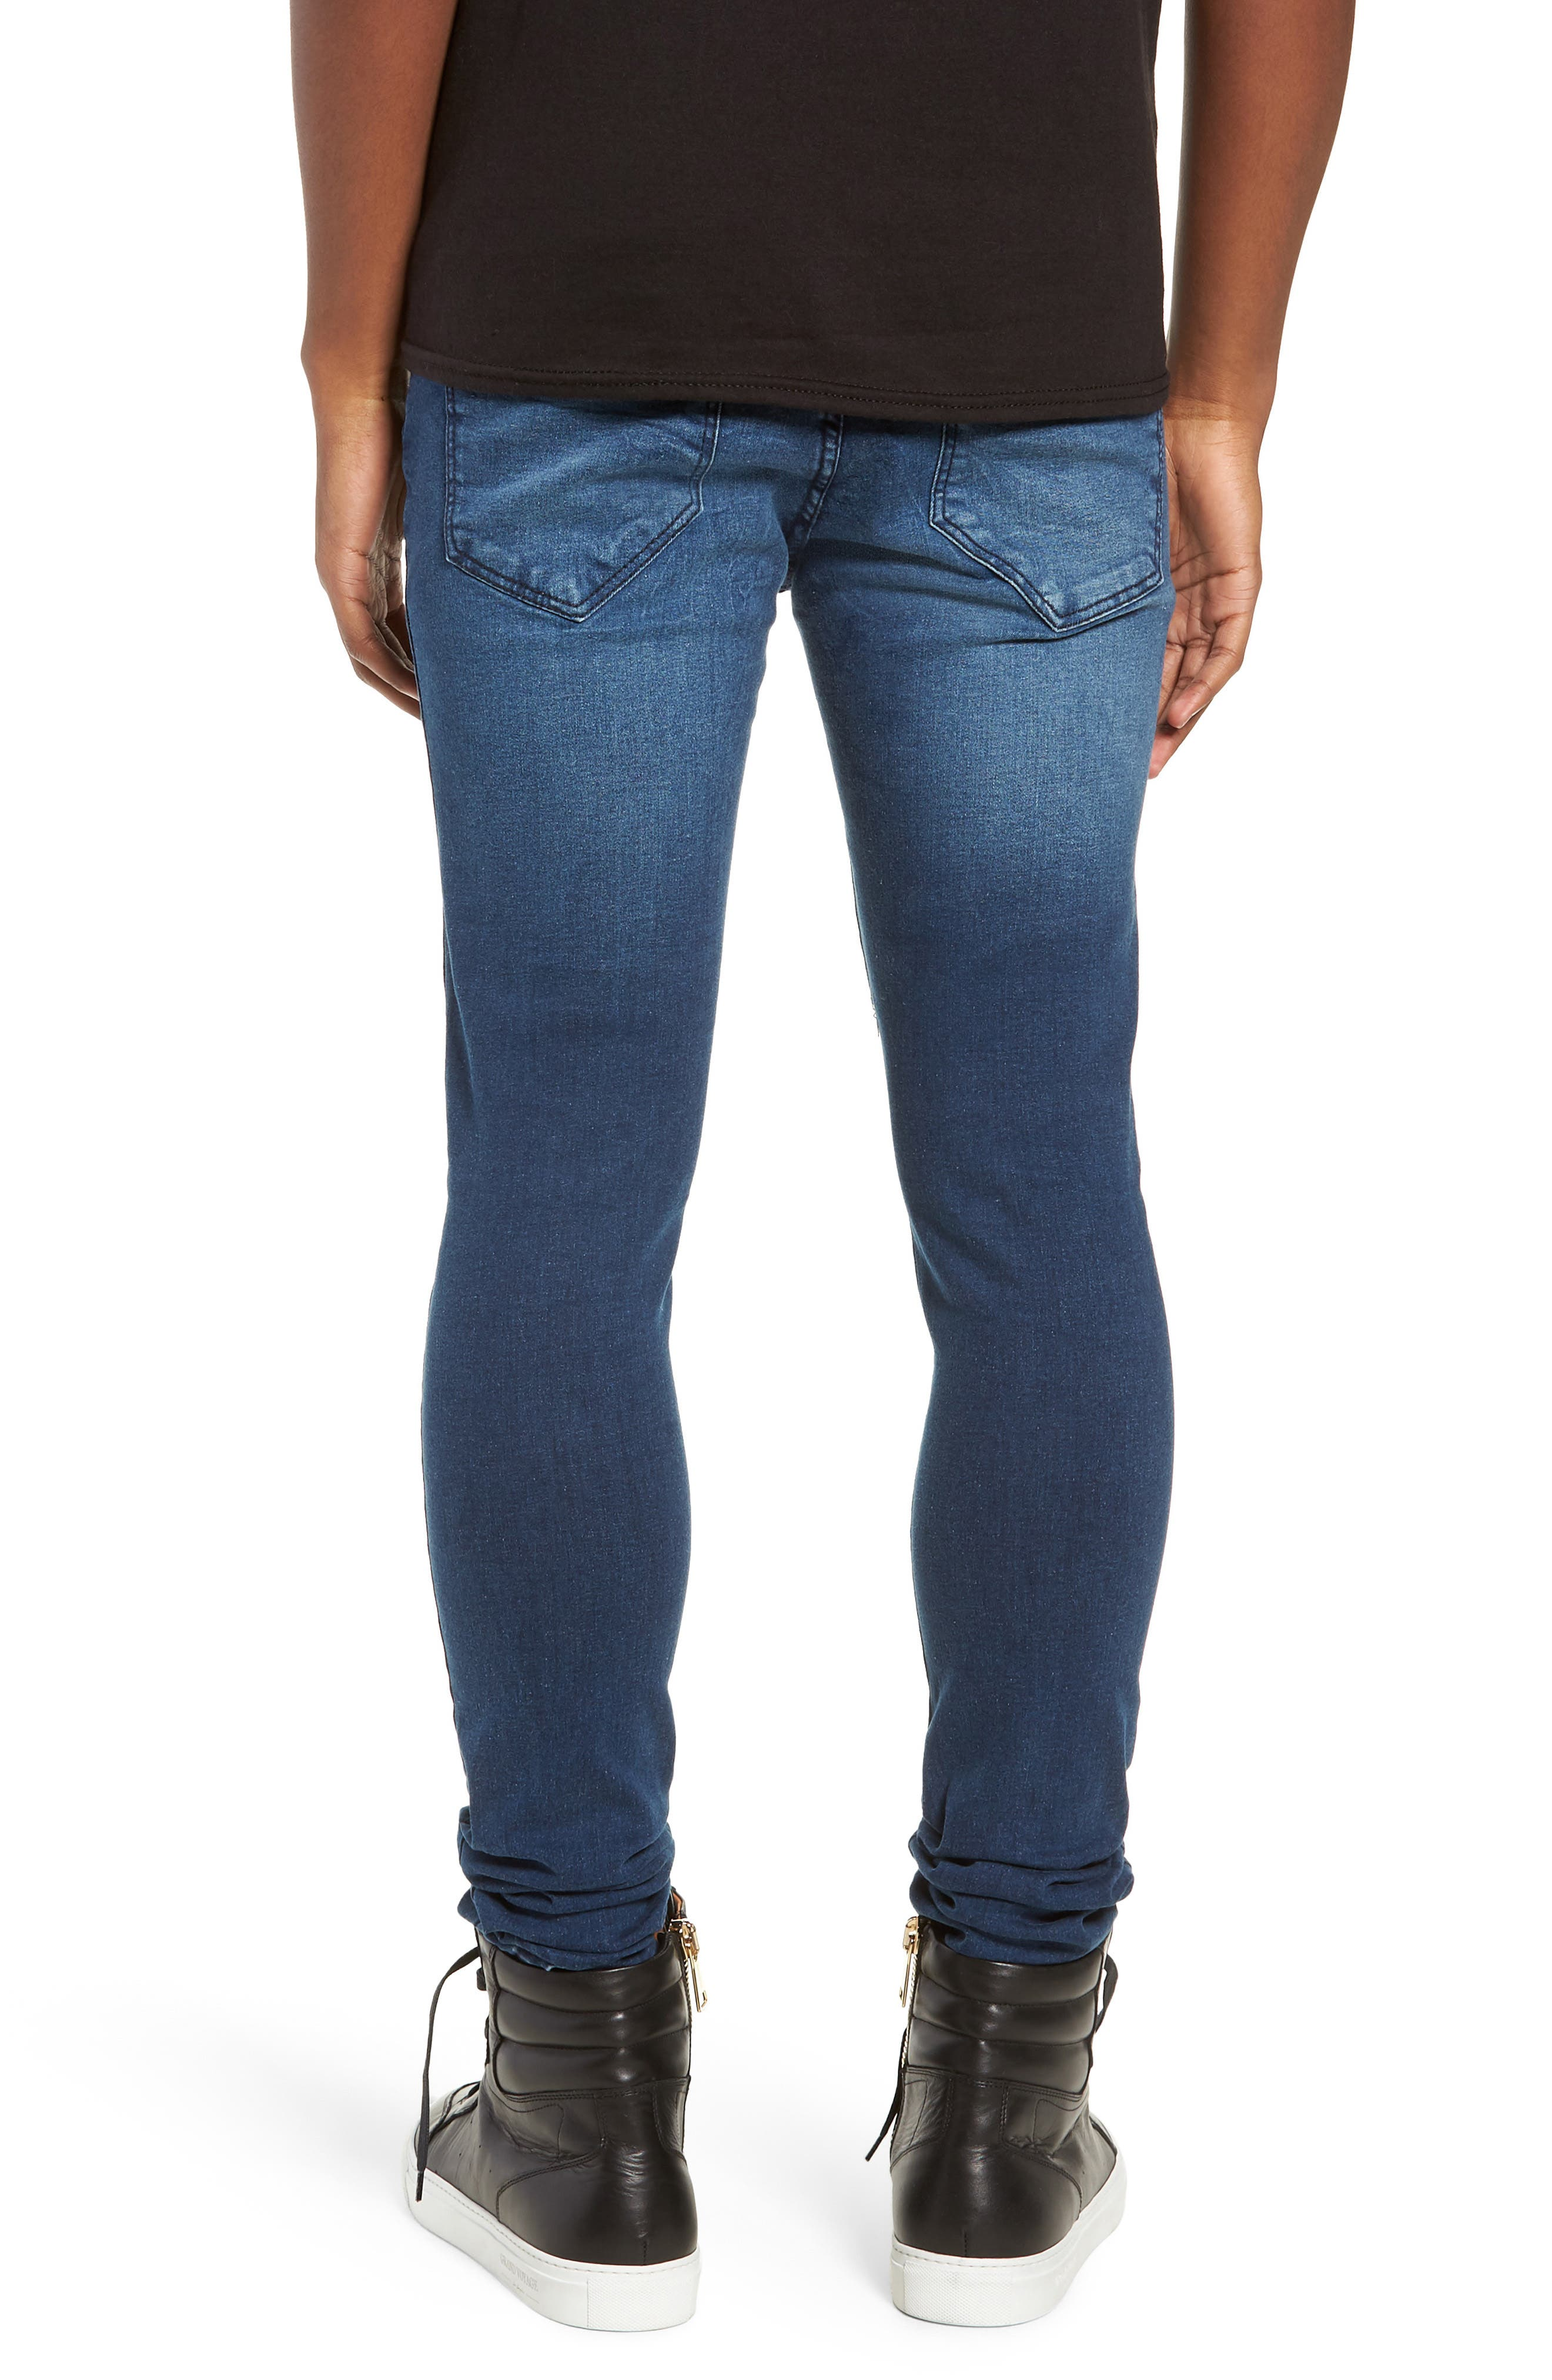 Leroy Skinny Fit Jeans,                             Alternate thumbnail 2, color,                             WORN DARK BLUE